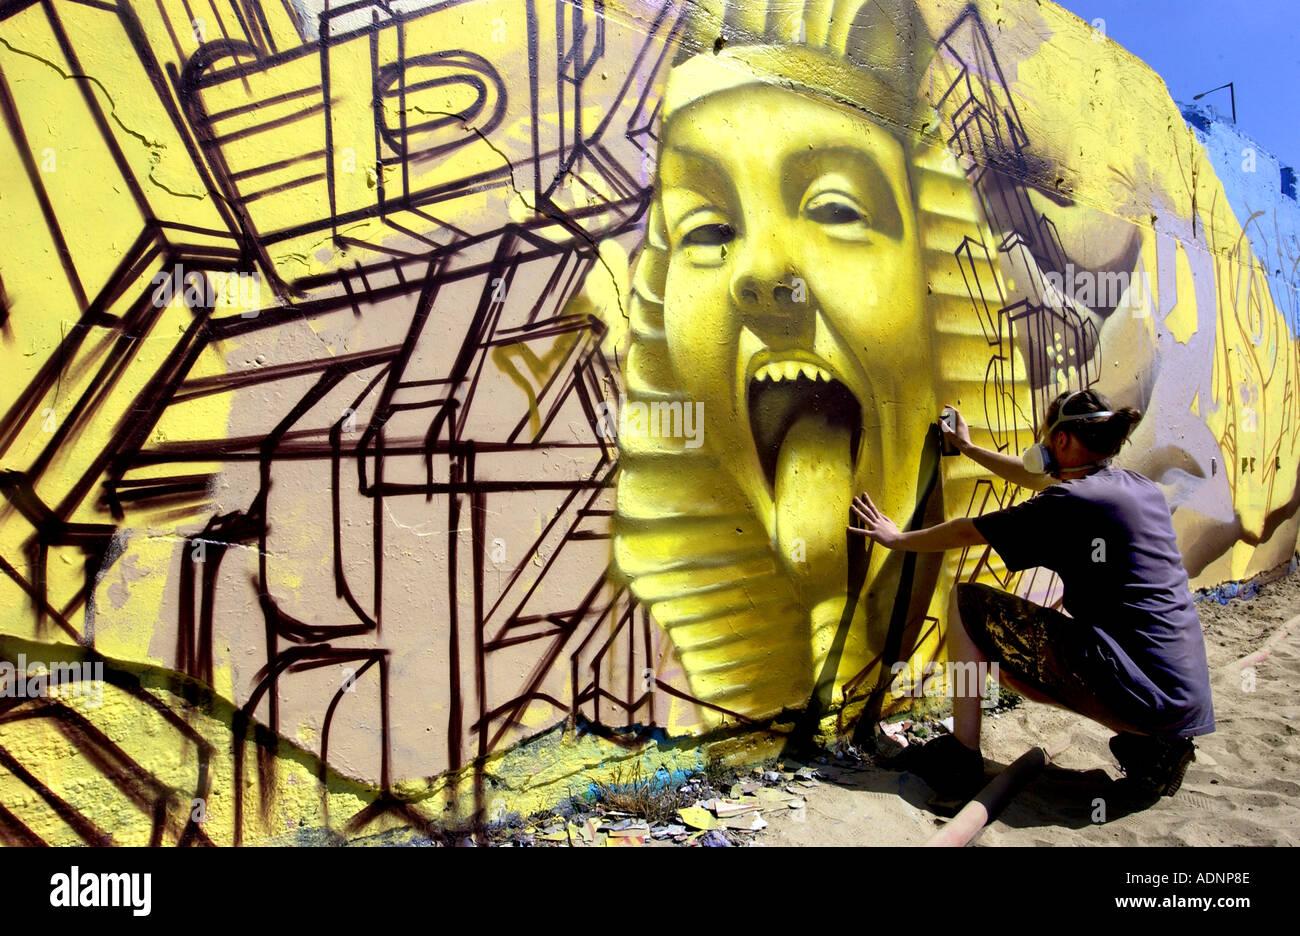 urban street art meets the ancient egyptians as graffiti artist creates a pharoah - Stock Image